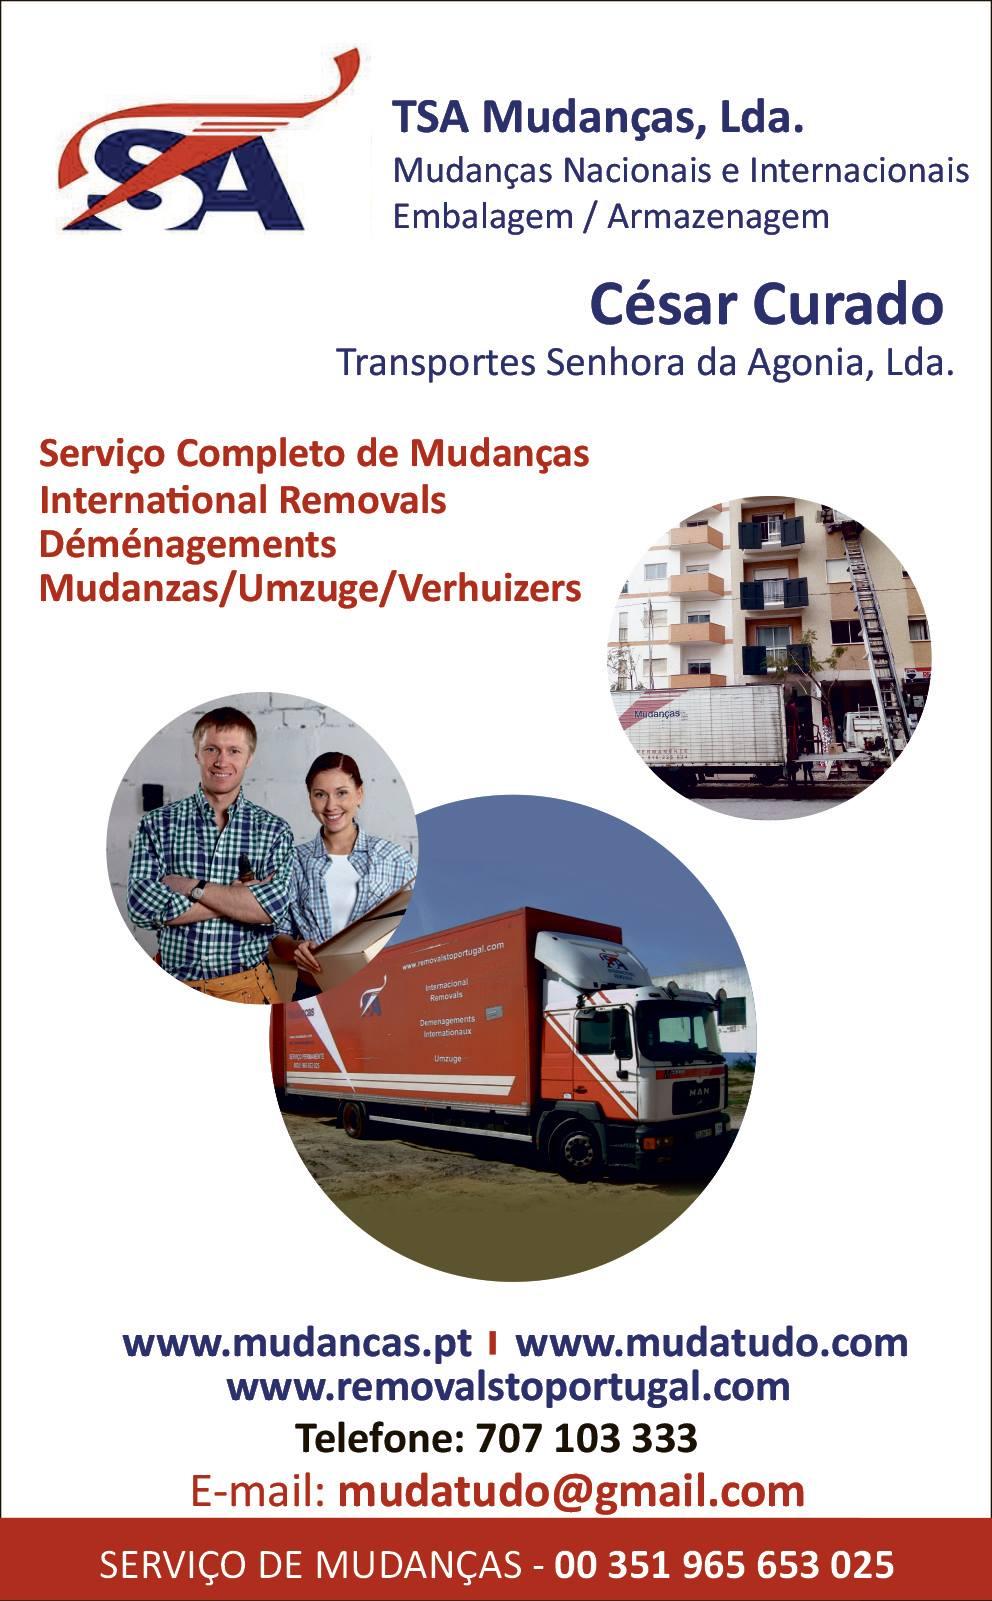 Recommandations, clients, transports, déménagements, déménagements internationaux